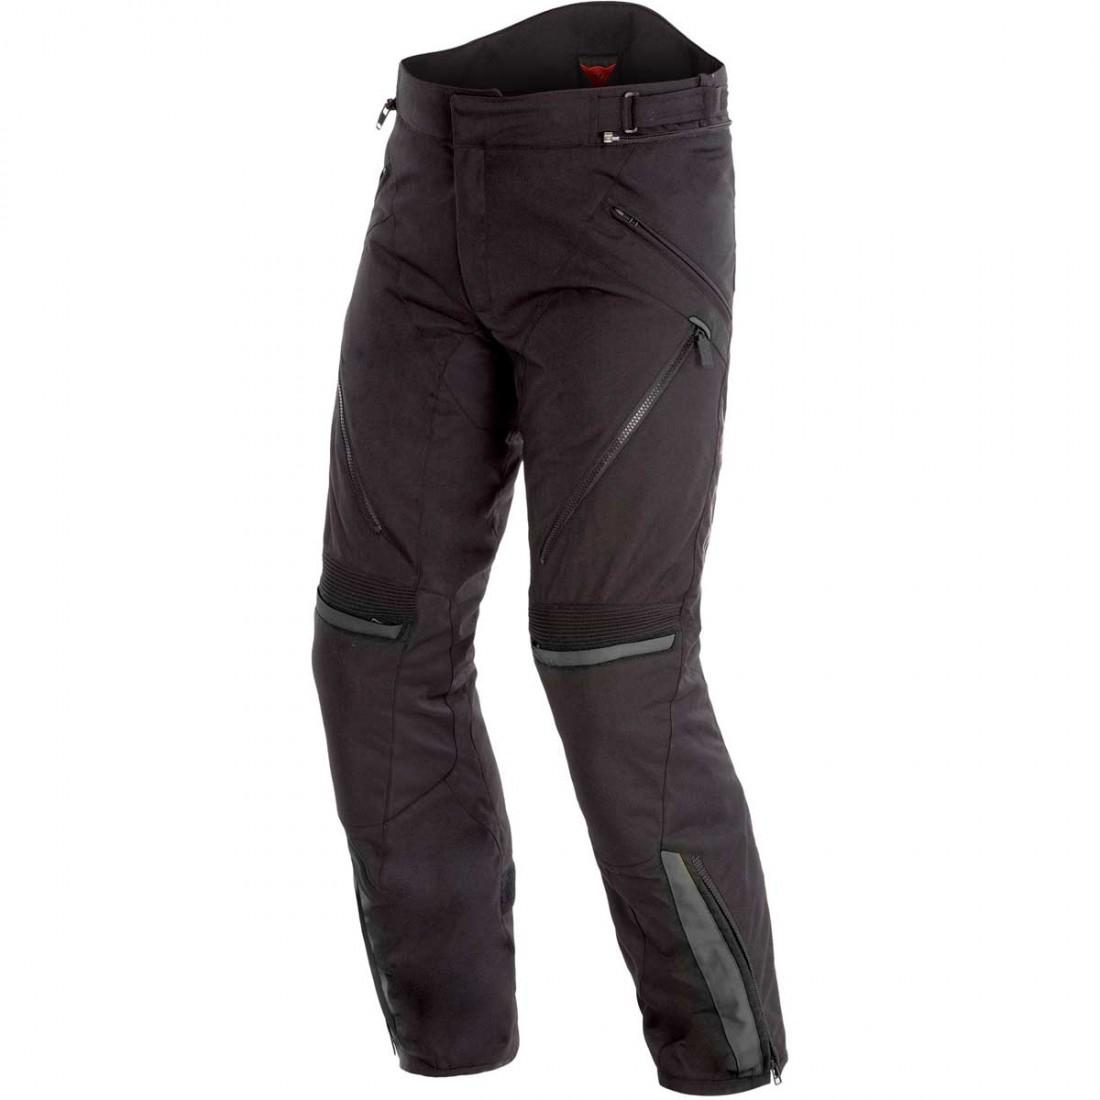 énorme réduction 42e92 3e99c Pantalon DAINESE Tempest 2 D-Dry Black / Ebony